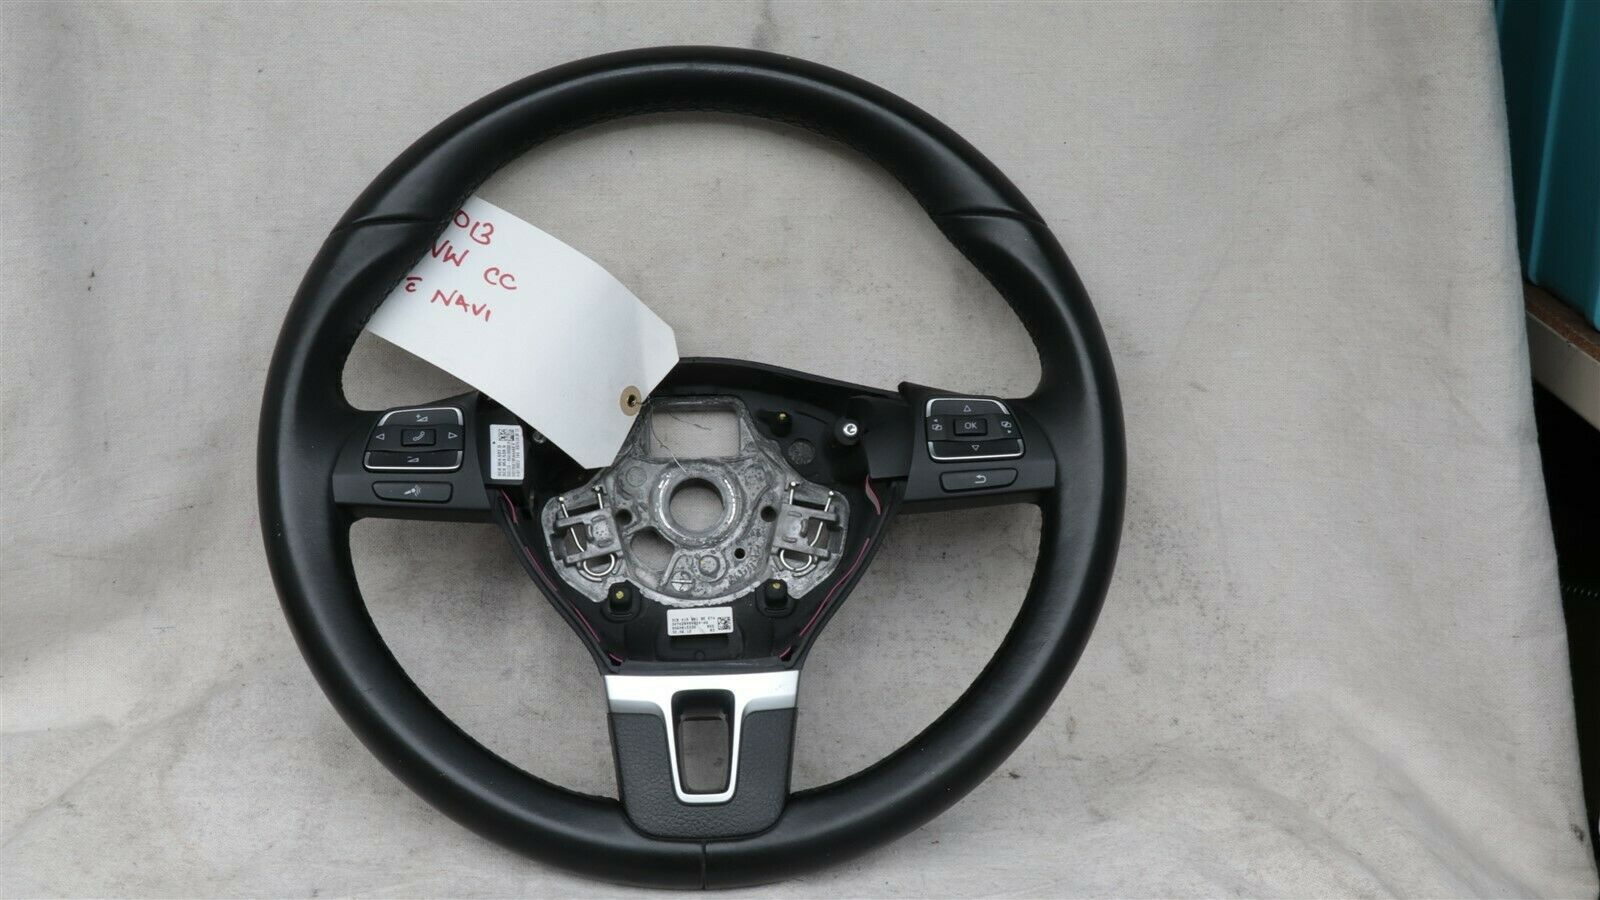 09 - 17 Volkswagen CC Eos Golf 3-Spoke Multifunction Steering Wheel Blck Leather